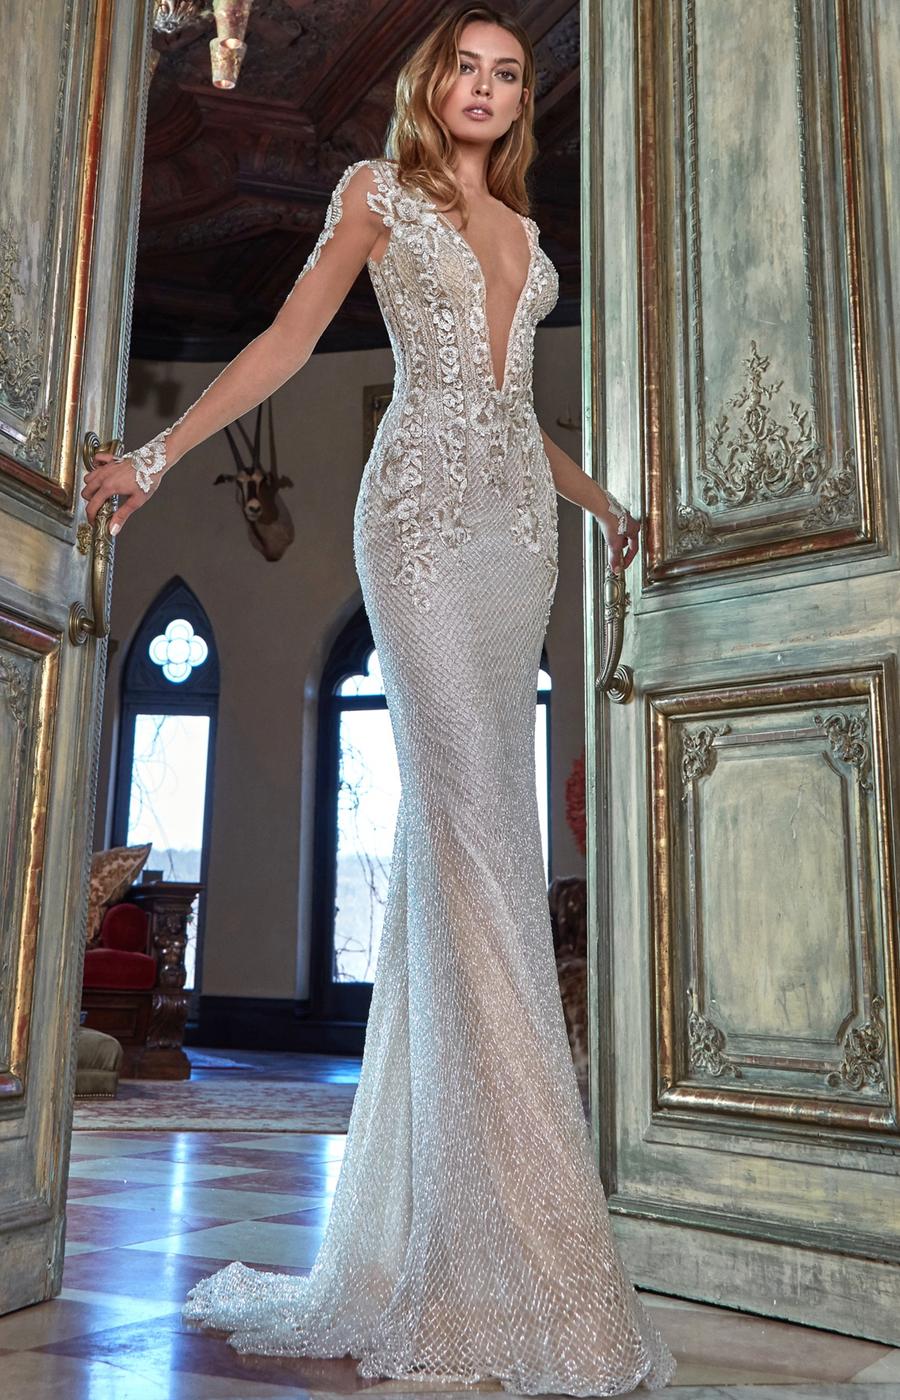 Galia lahav le secret royal bella wedding dresses pinterest